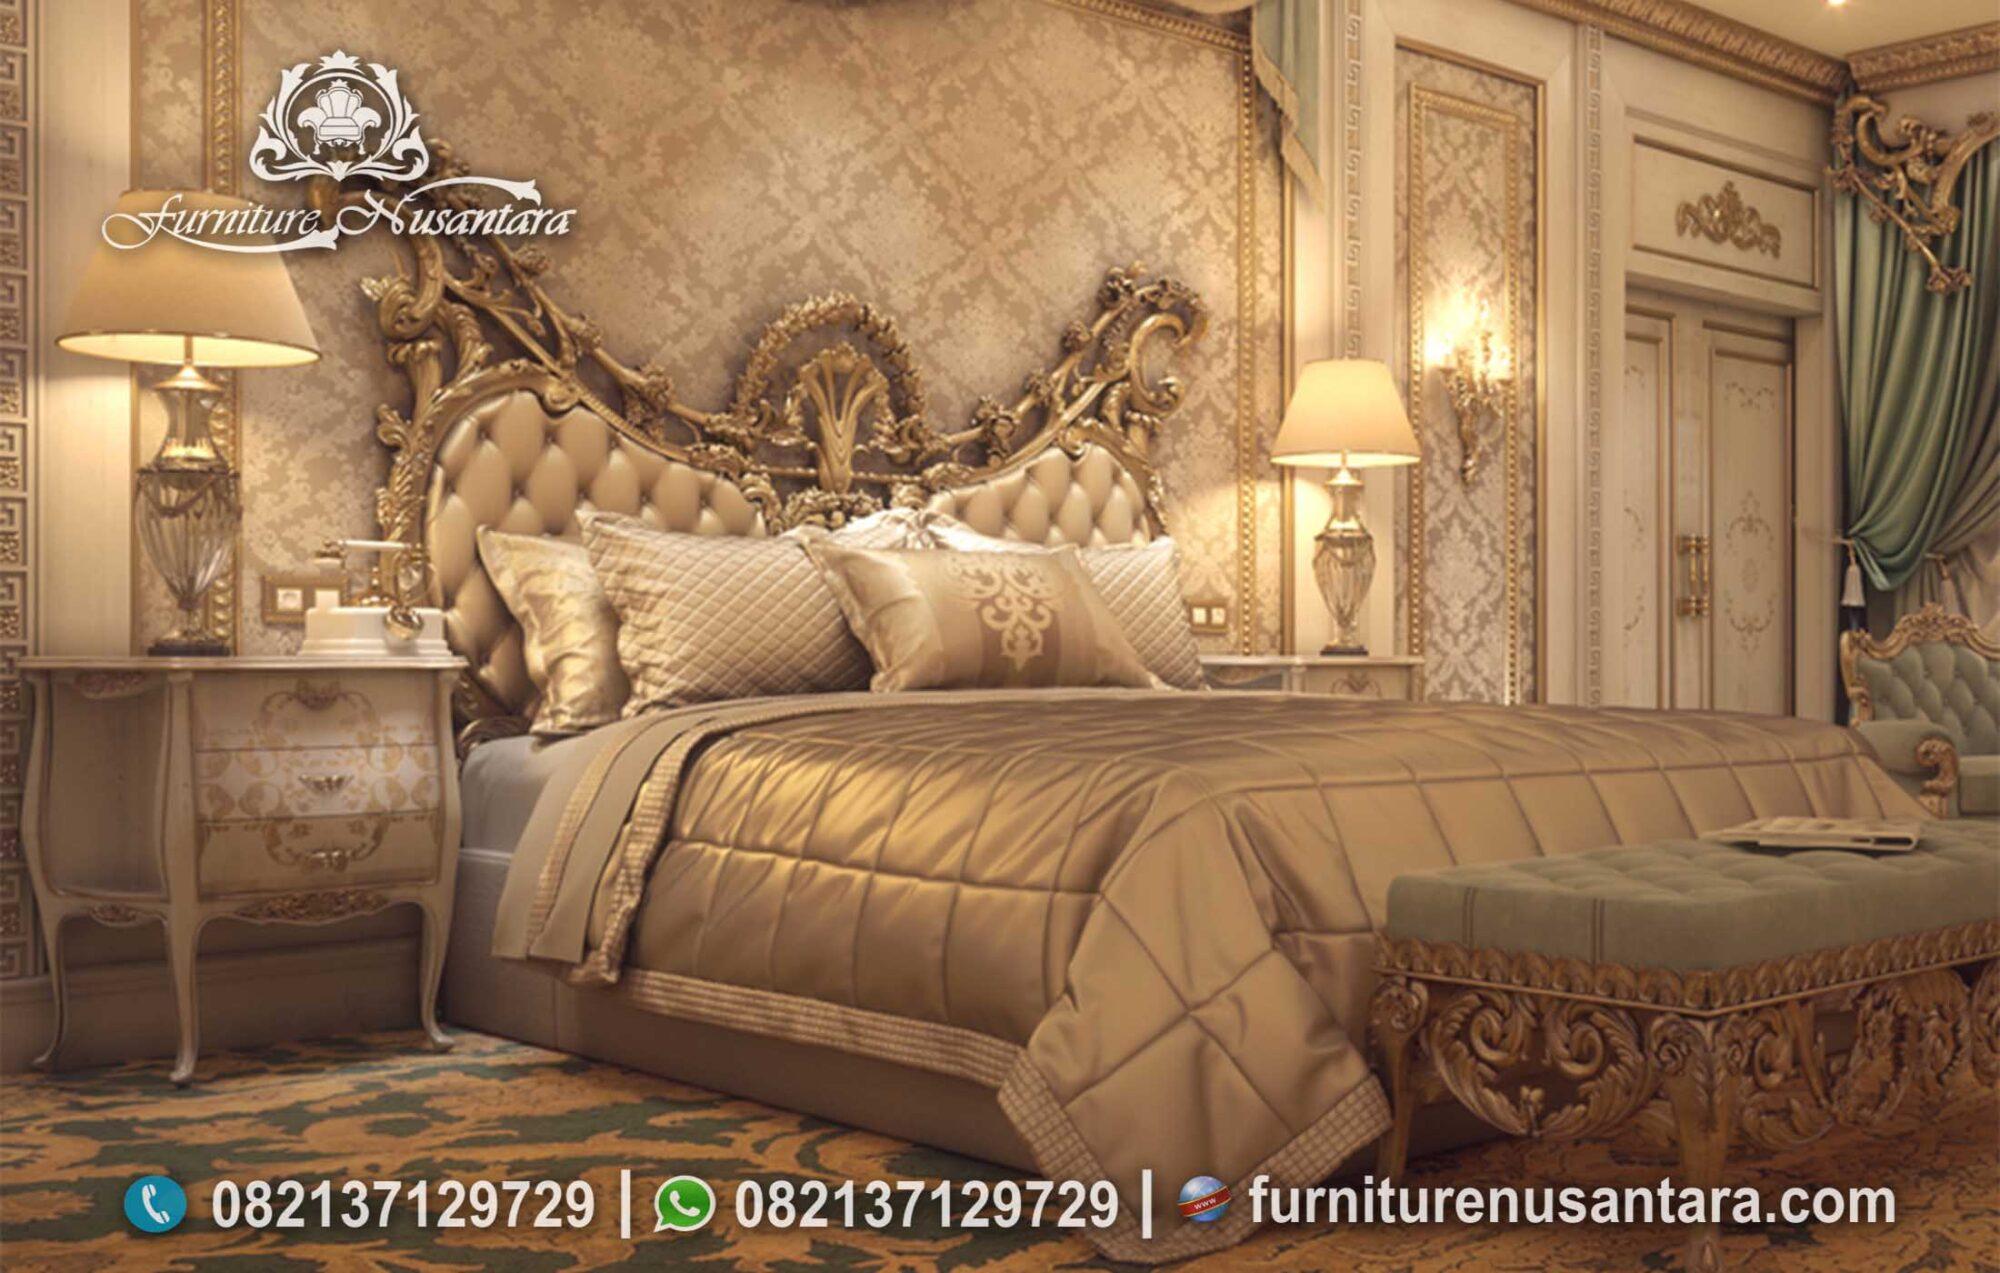 Kamar Set Modern Terbaik KS-109, Furniture Nusantara